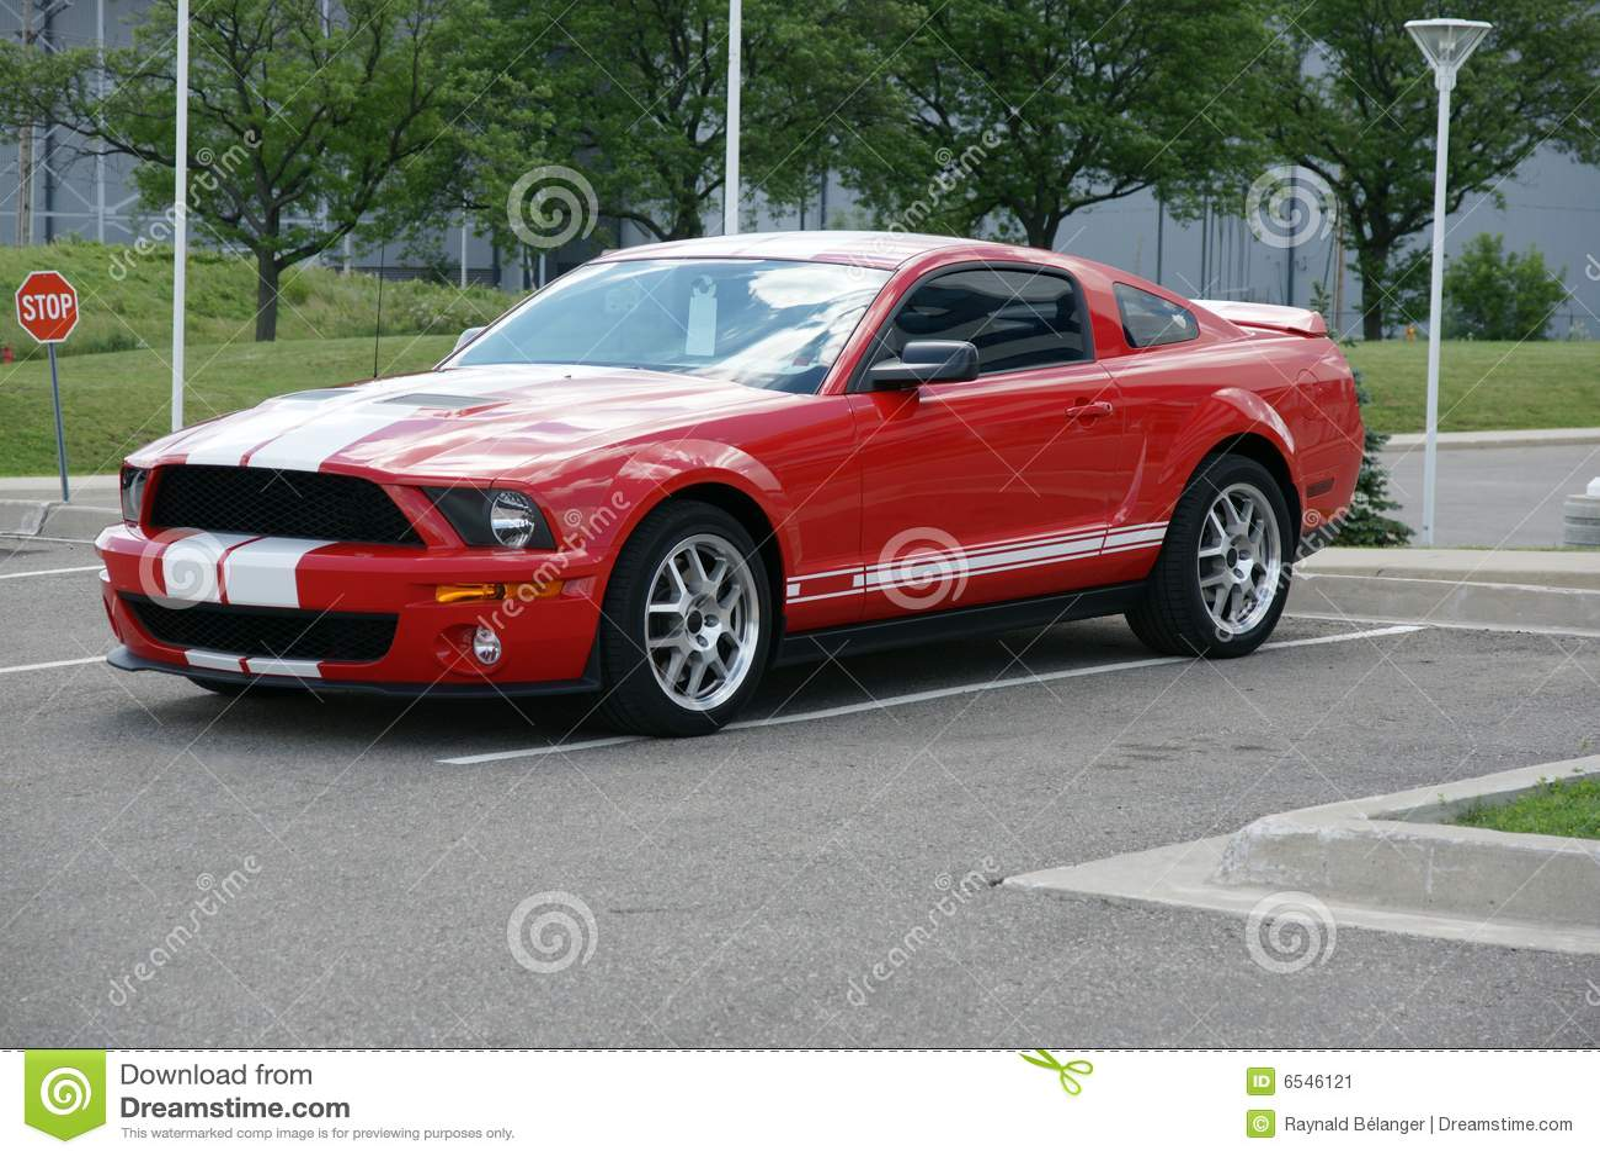 Shelby stock image image of char autos cobra photo 6546121